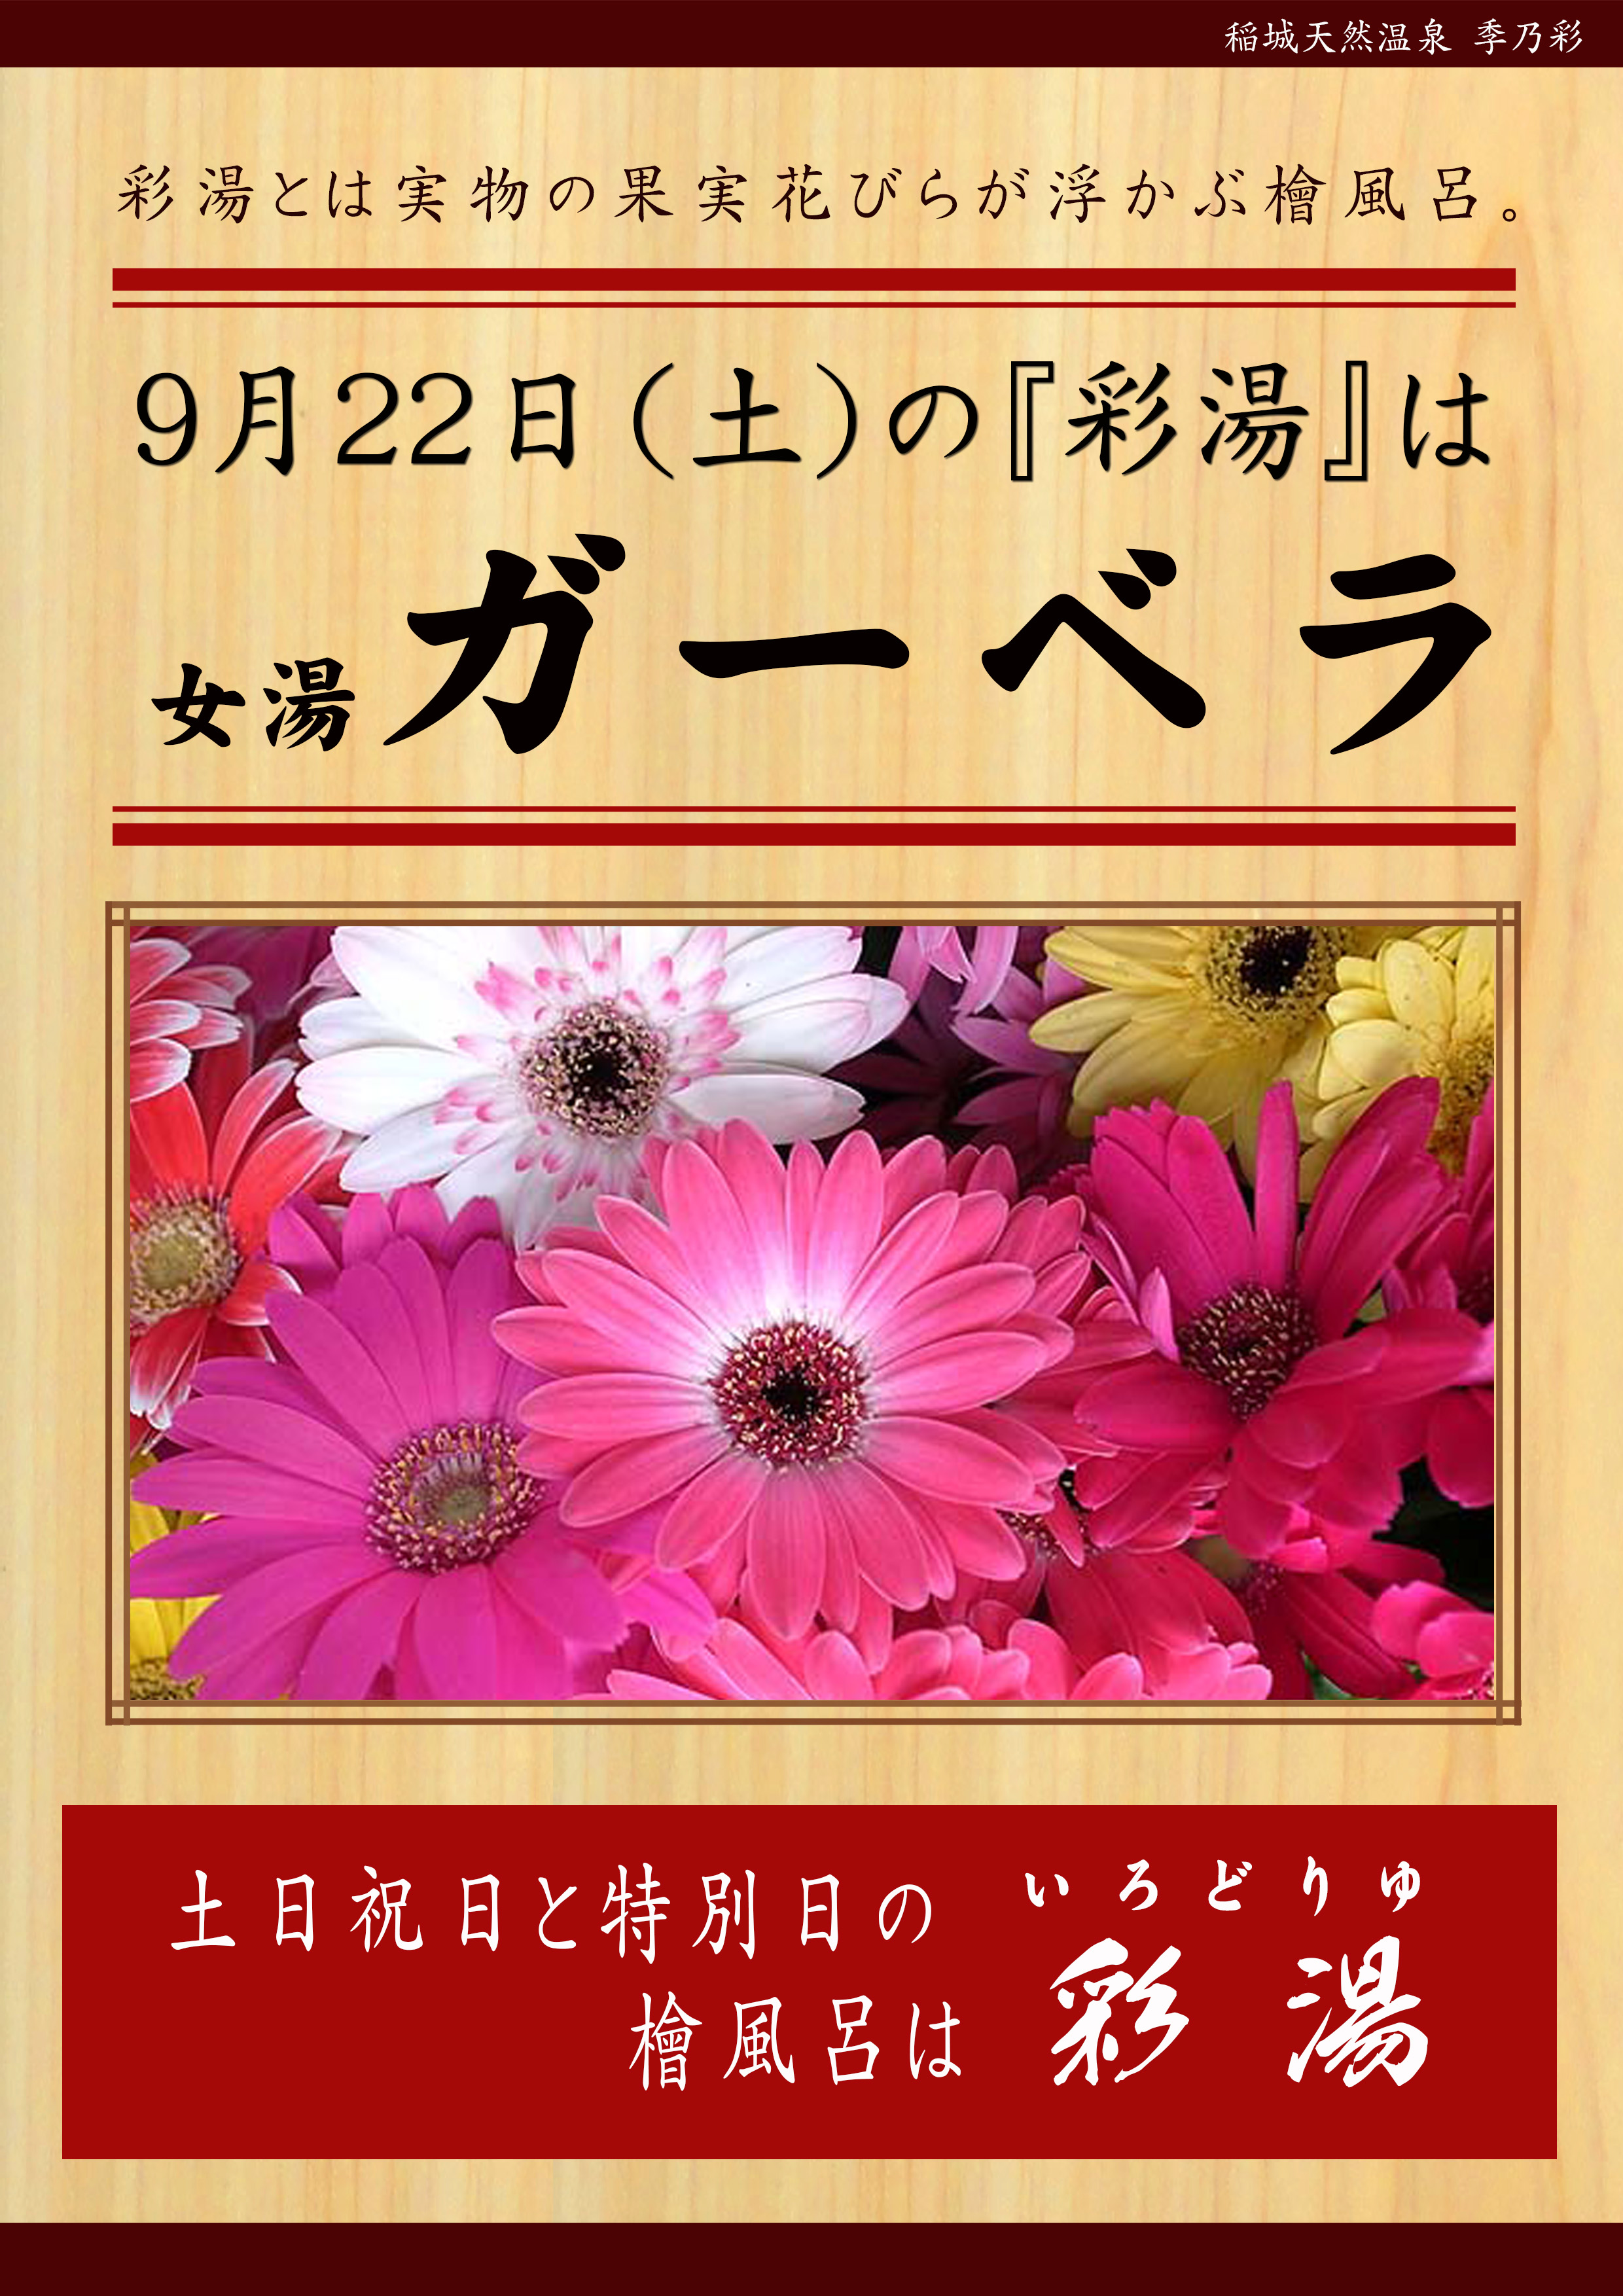 20180922POP イベント 彩湯 女湯 ガーベラ